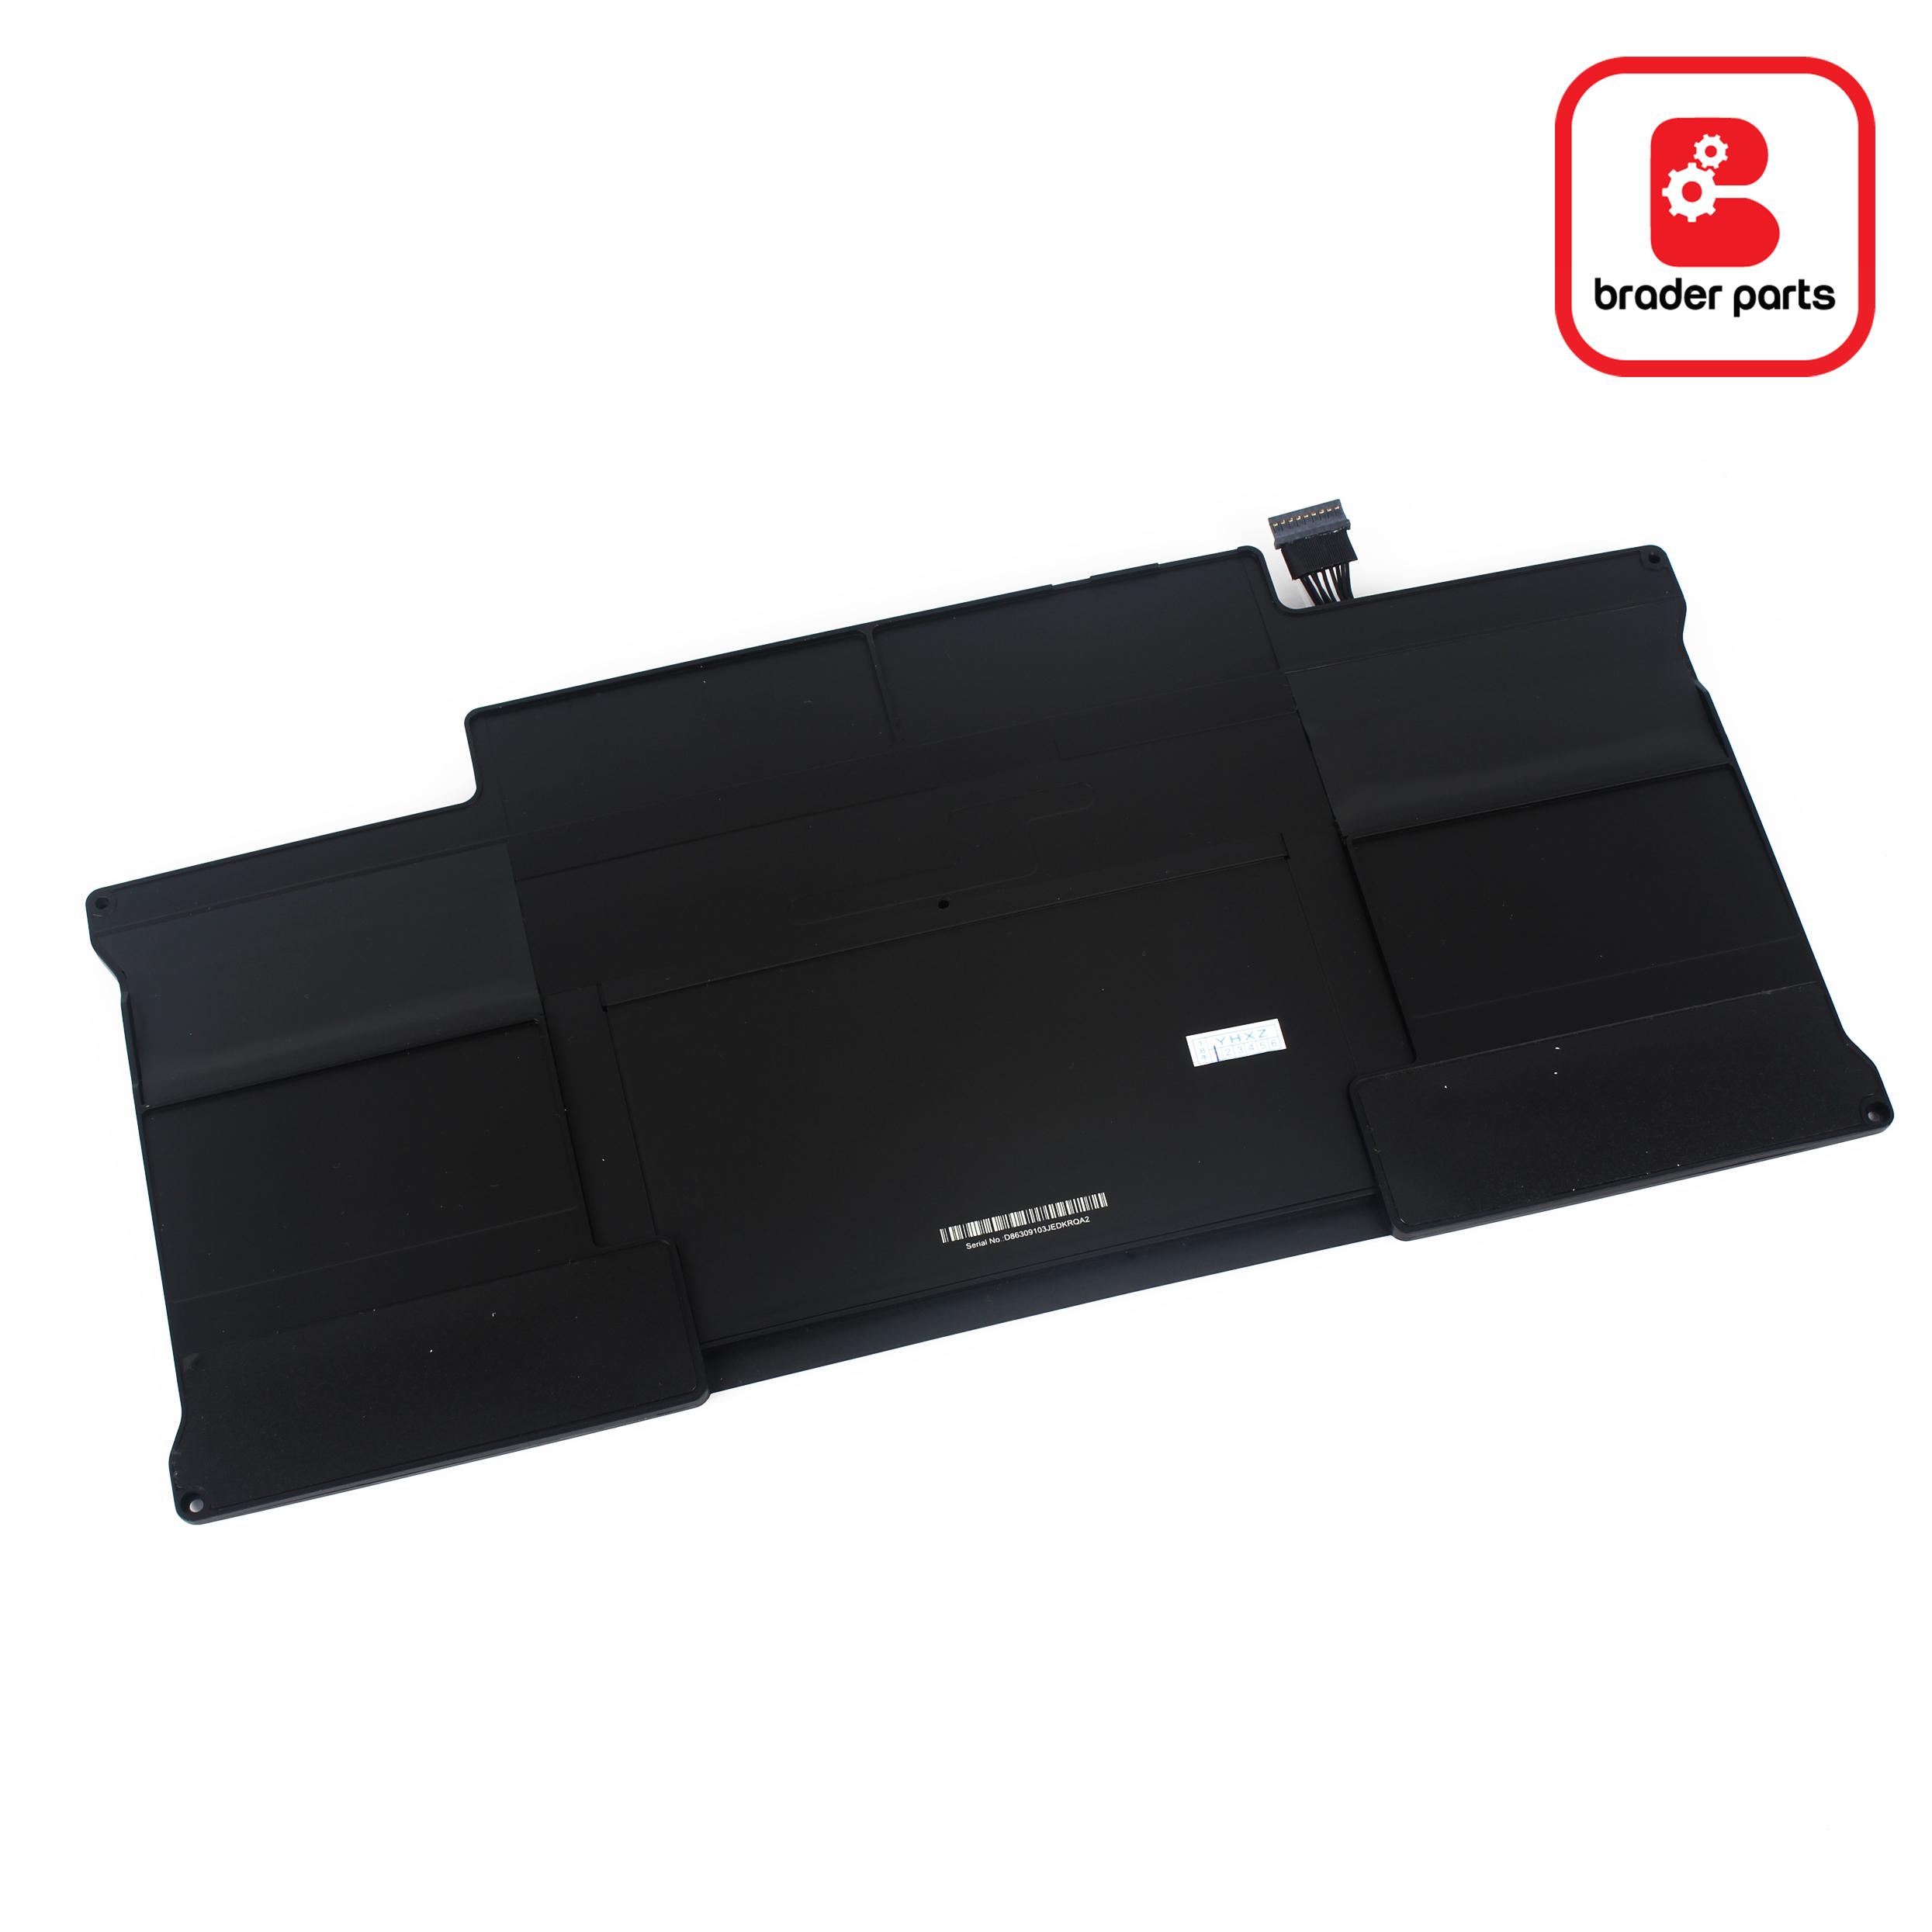 "Baterai Macbook Air 13"" A1466 (A1496)"